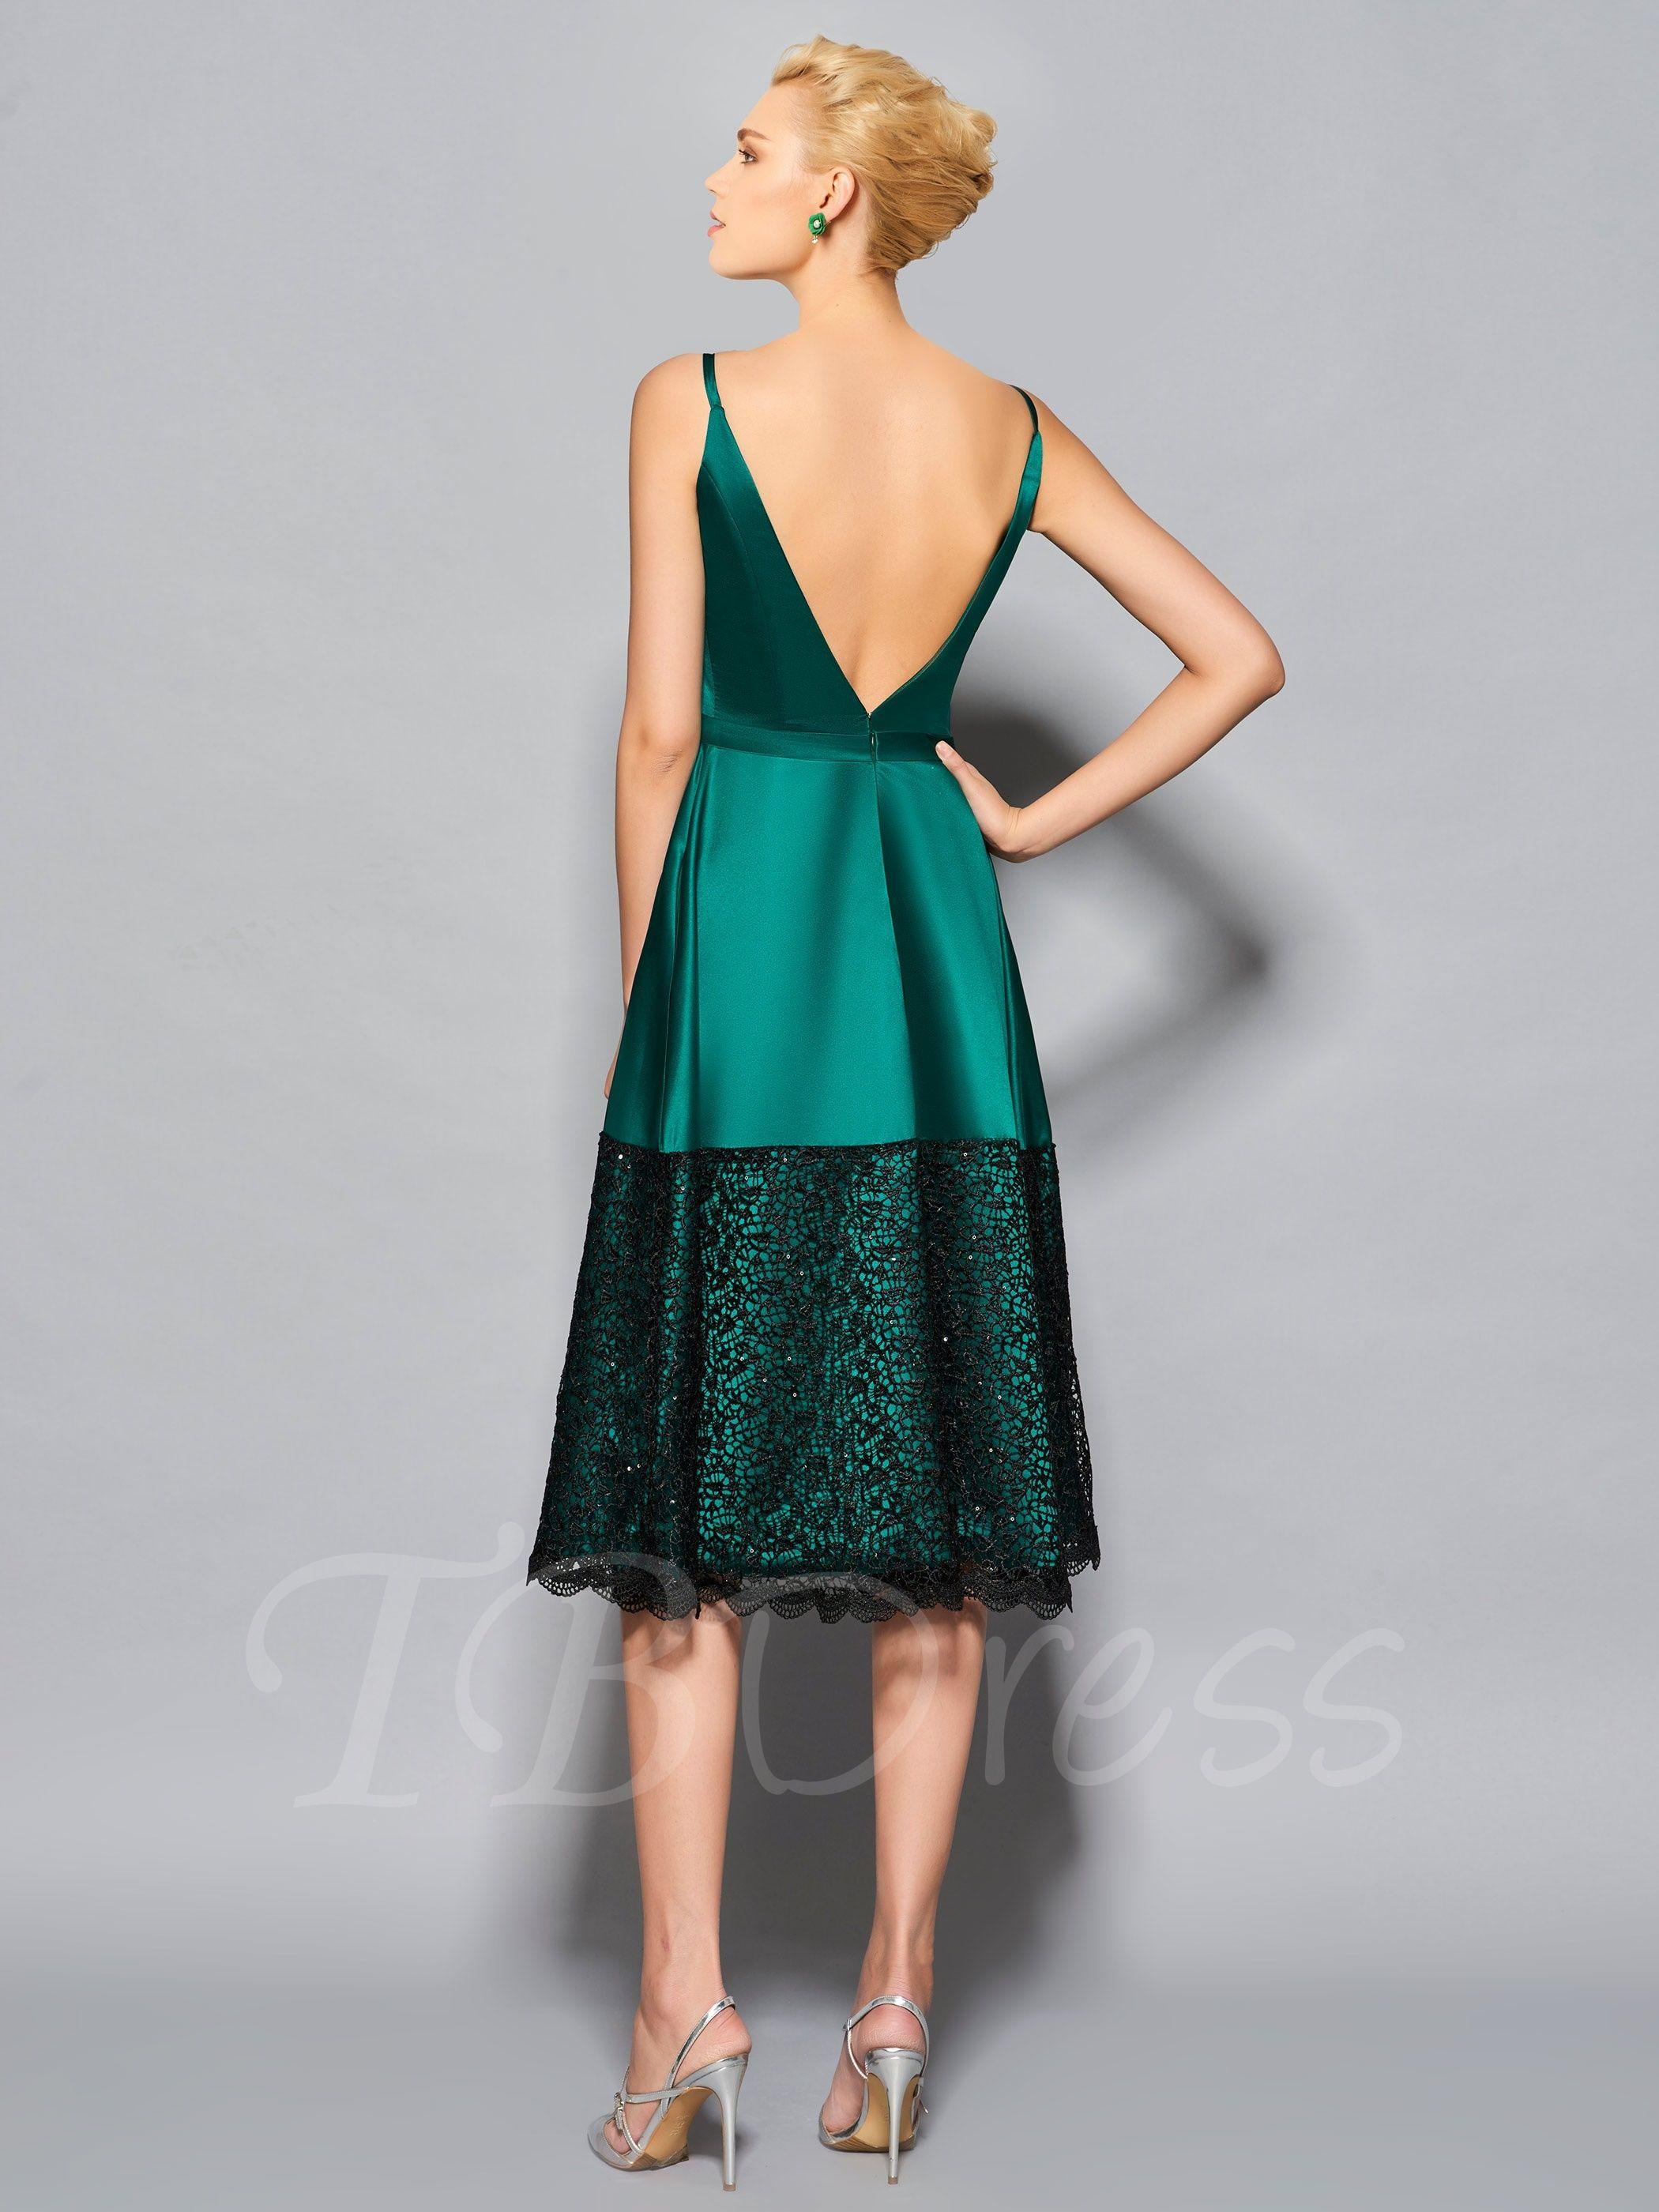 Spaghetti straps lace sashes tealength cocktail dress closet